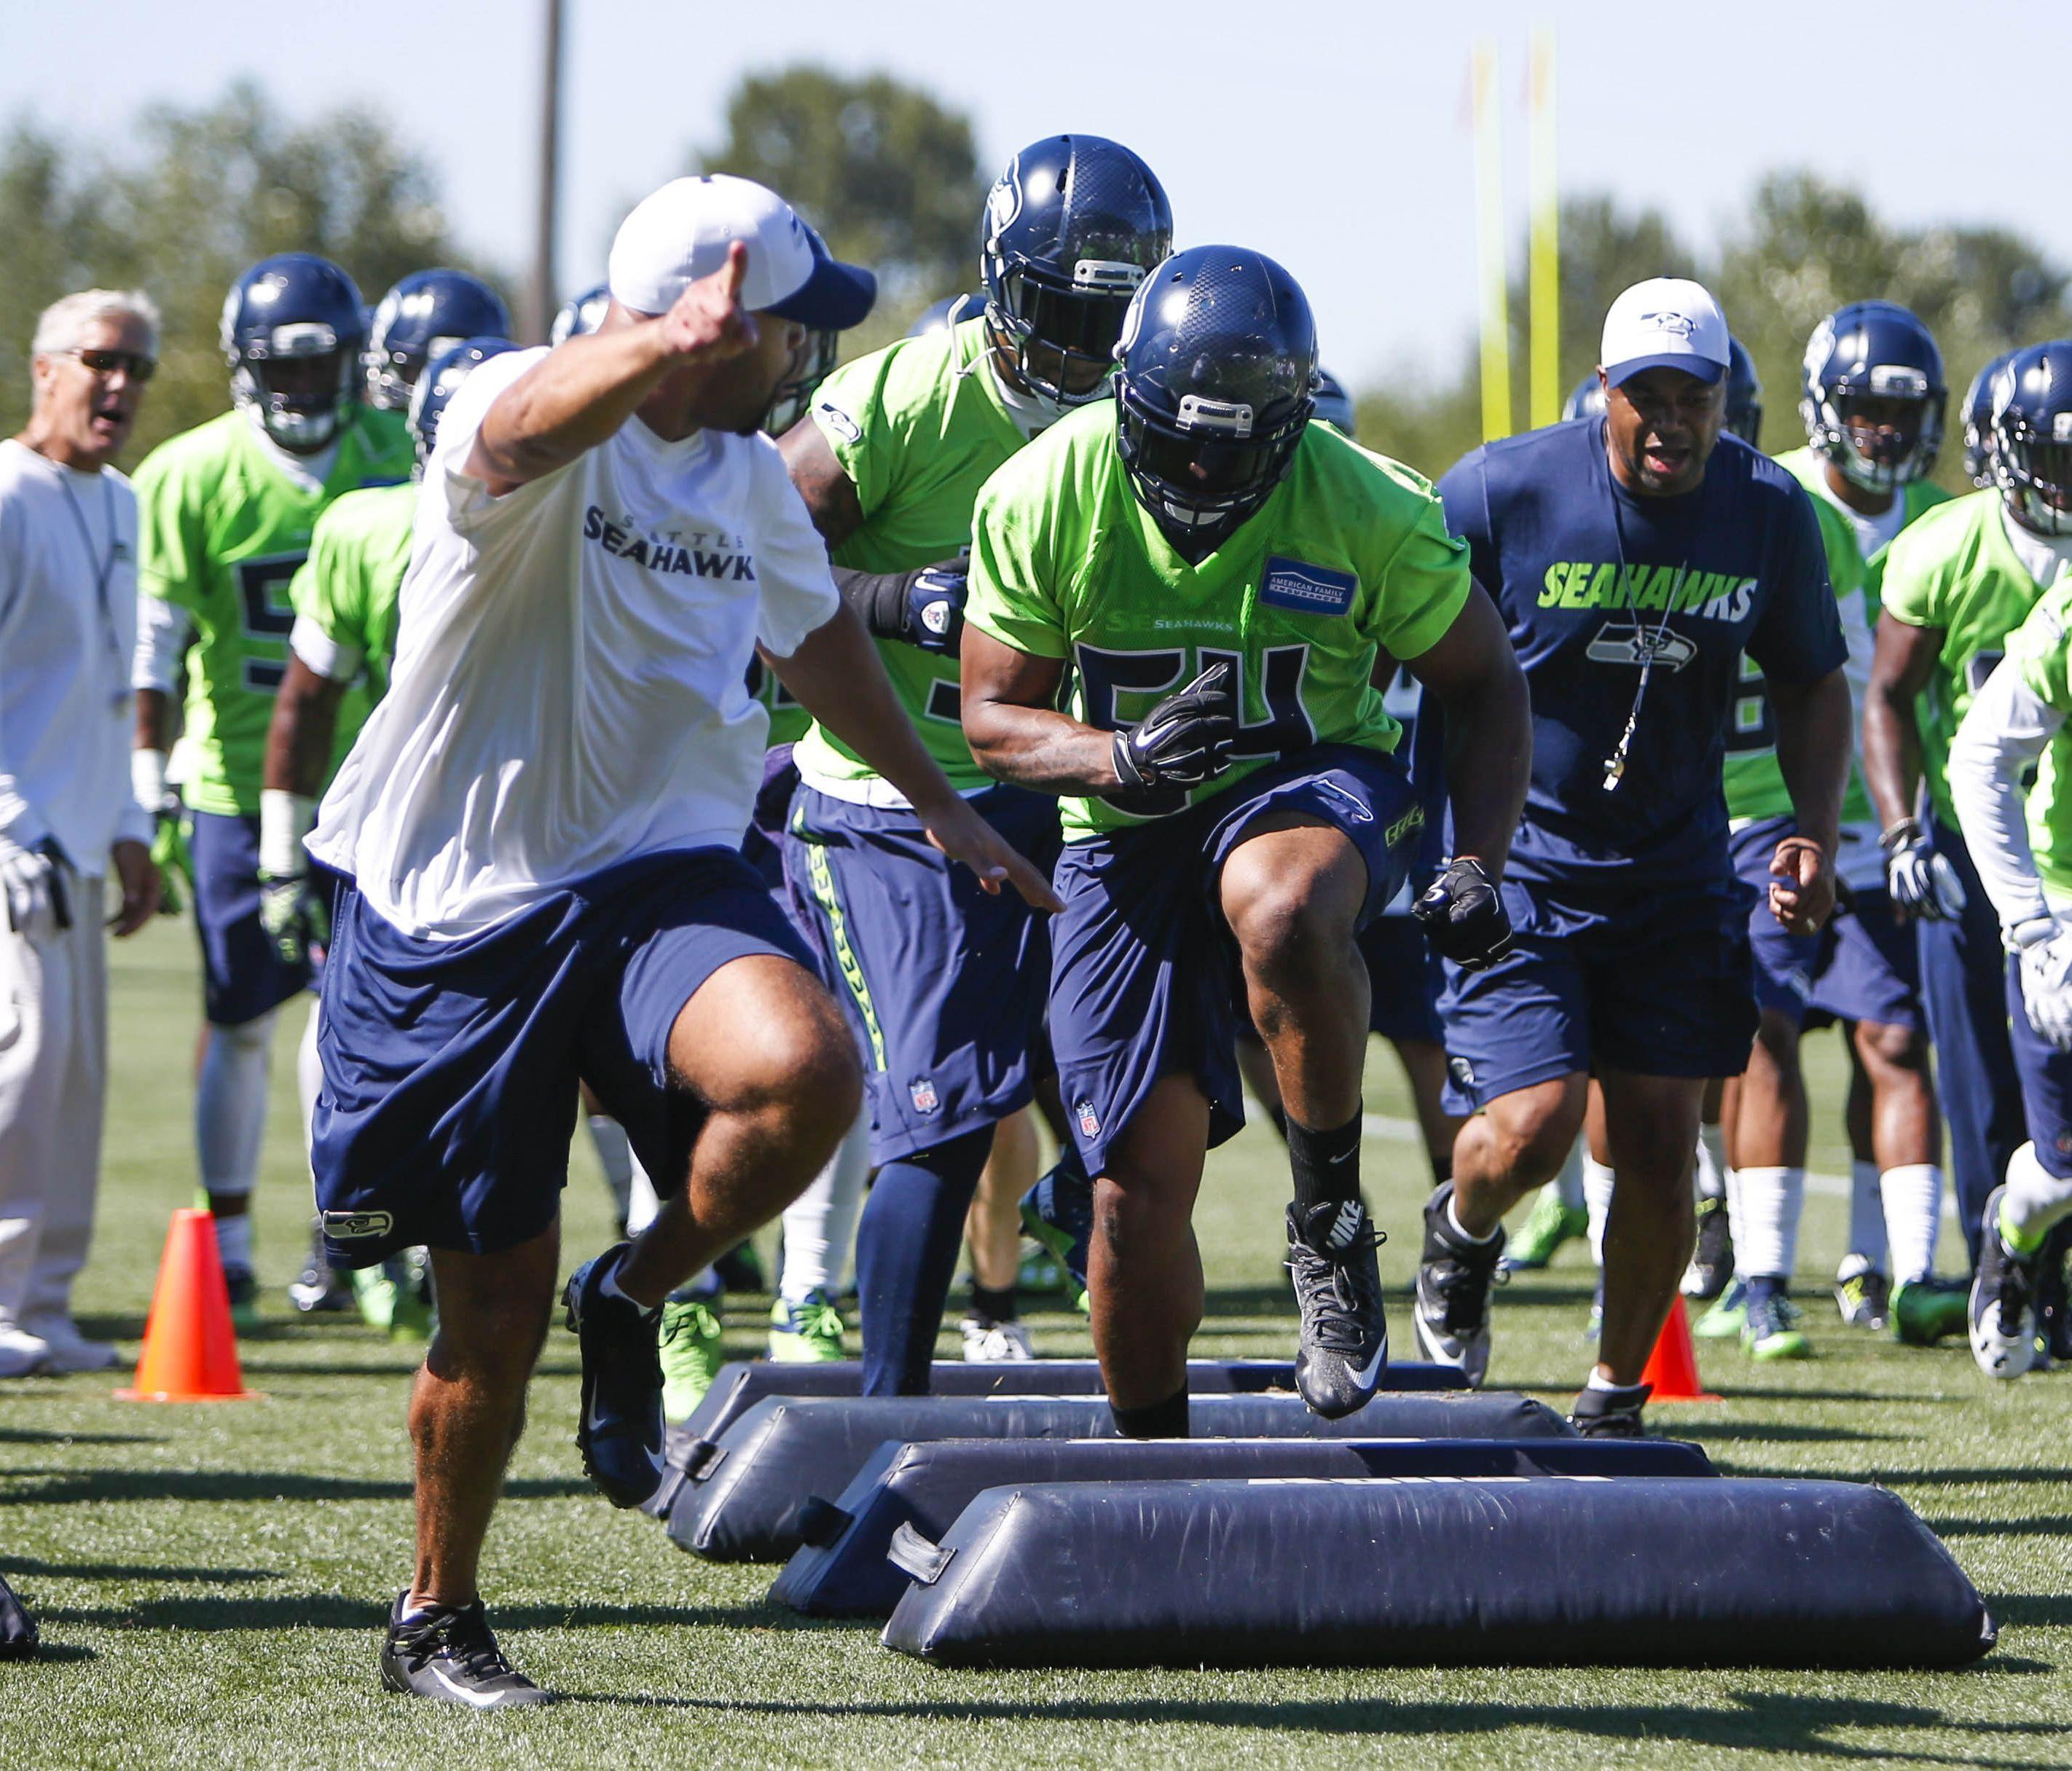 new styles 61042 e45f5 Seahawks Throwback Thursday: The green jerseys | krem.com